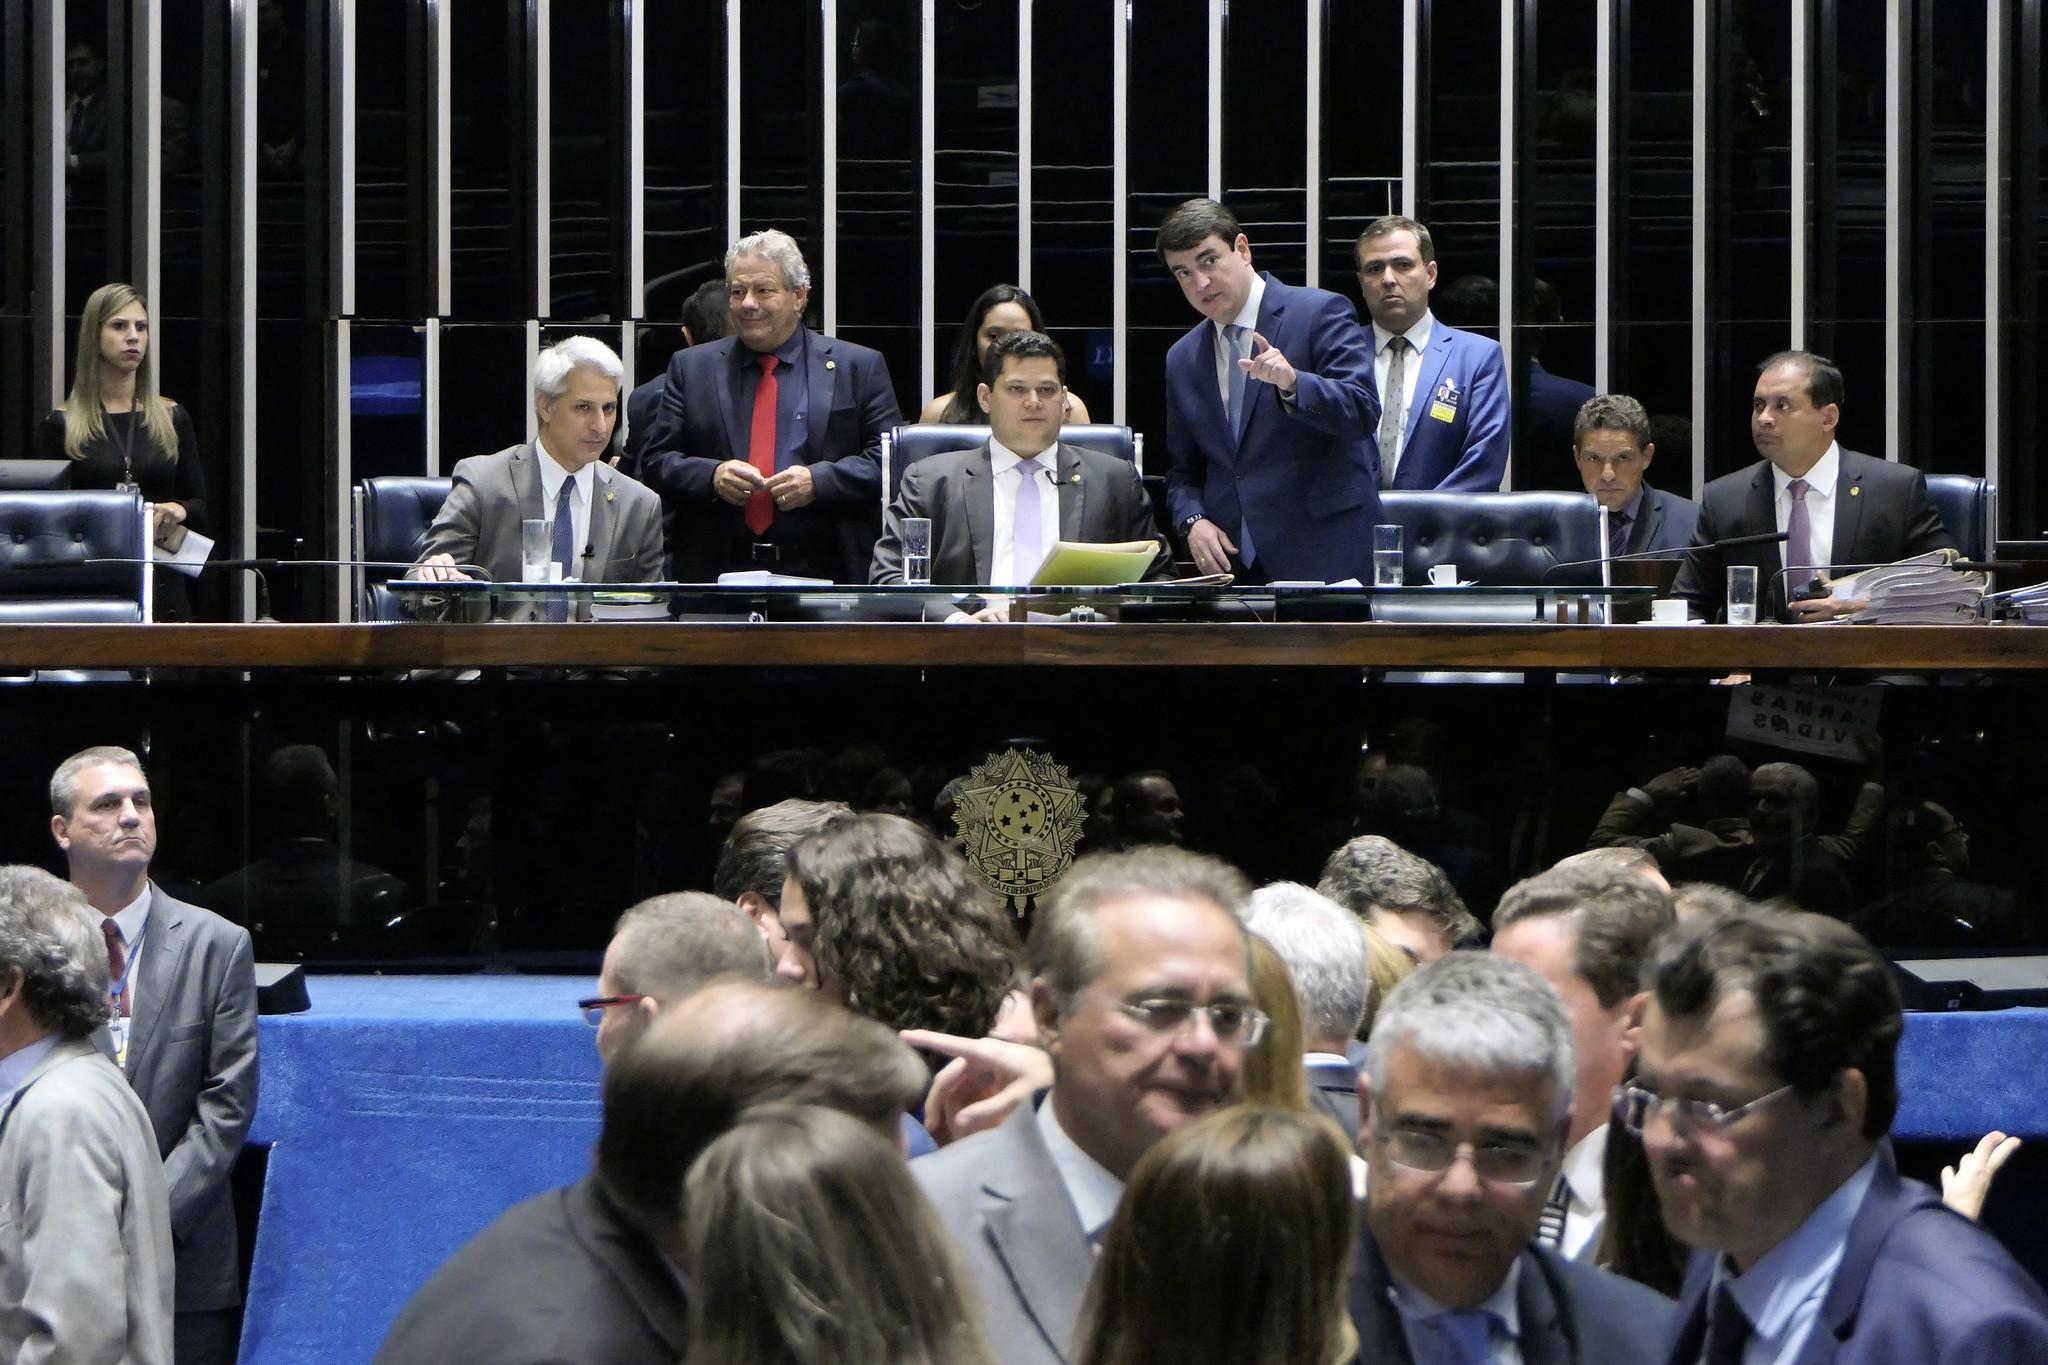 Roque de Sa Ag Senado